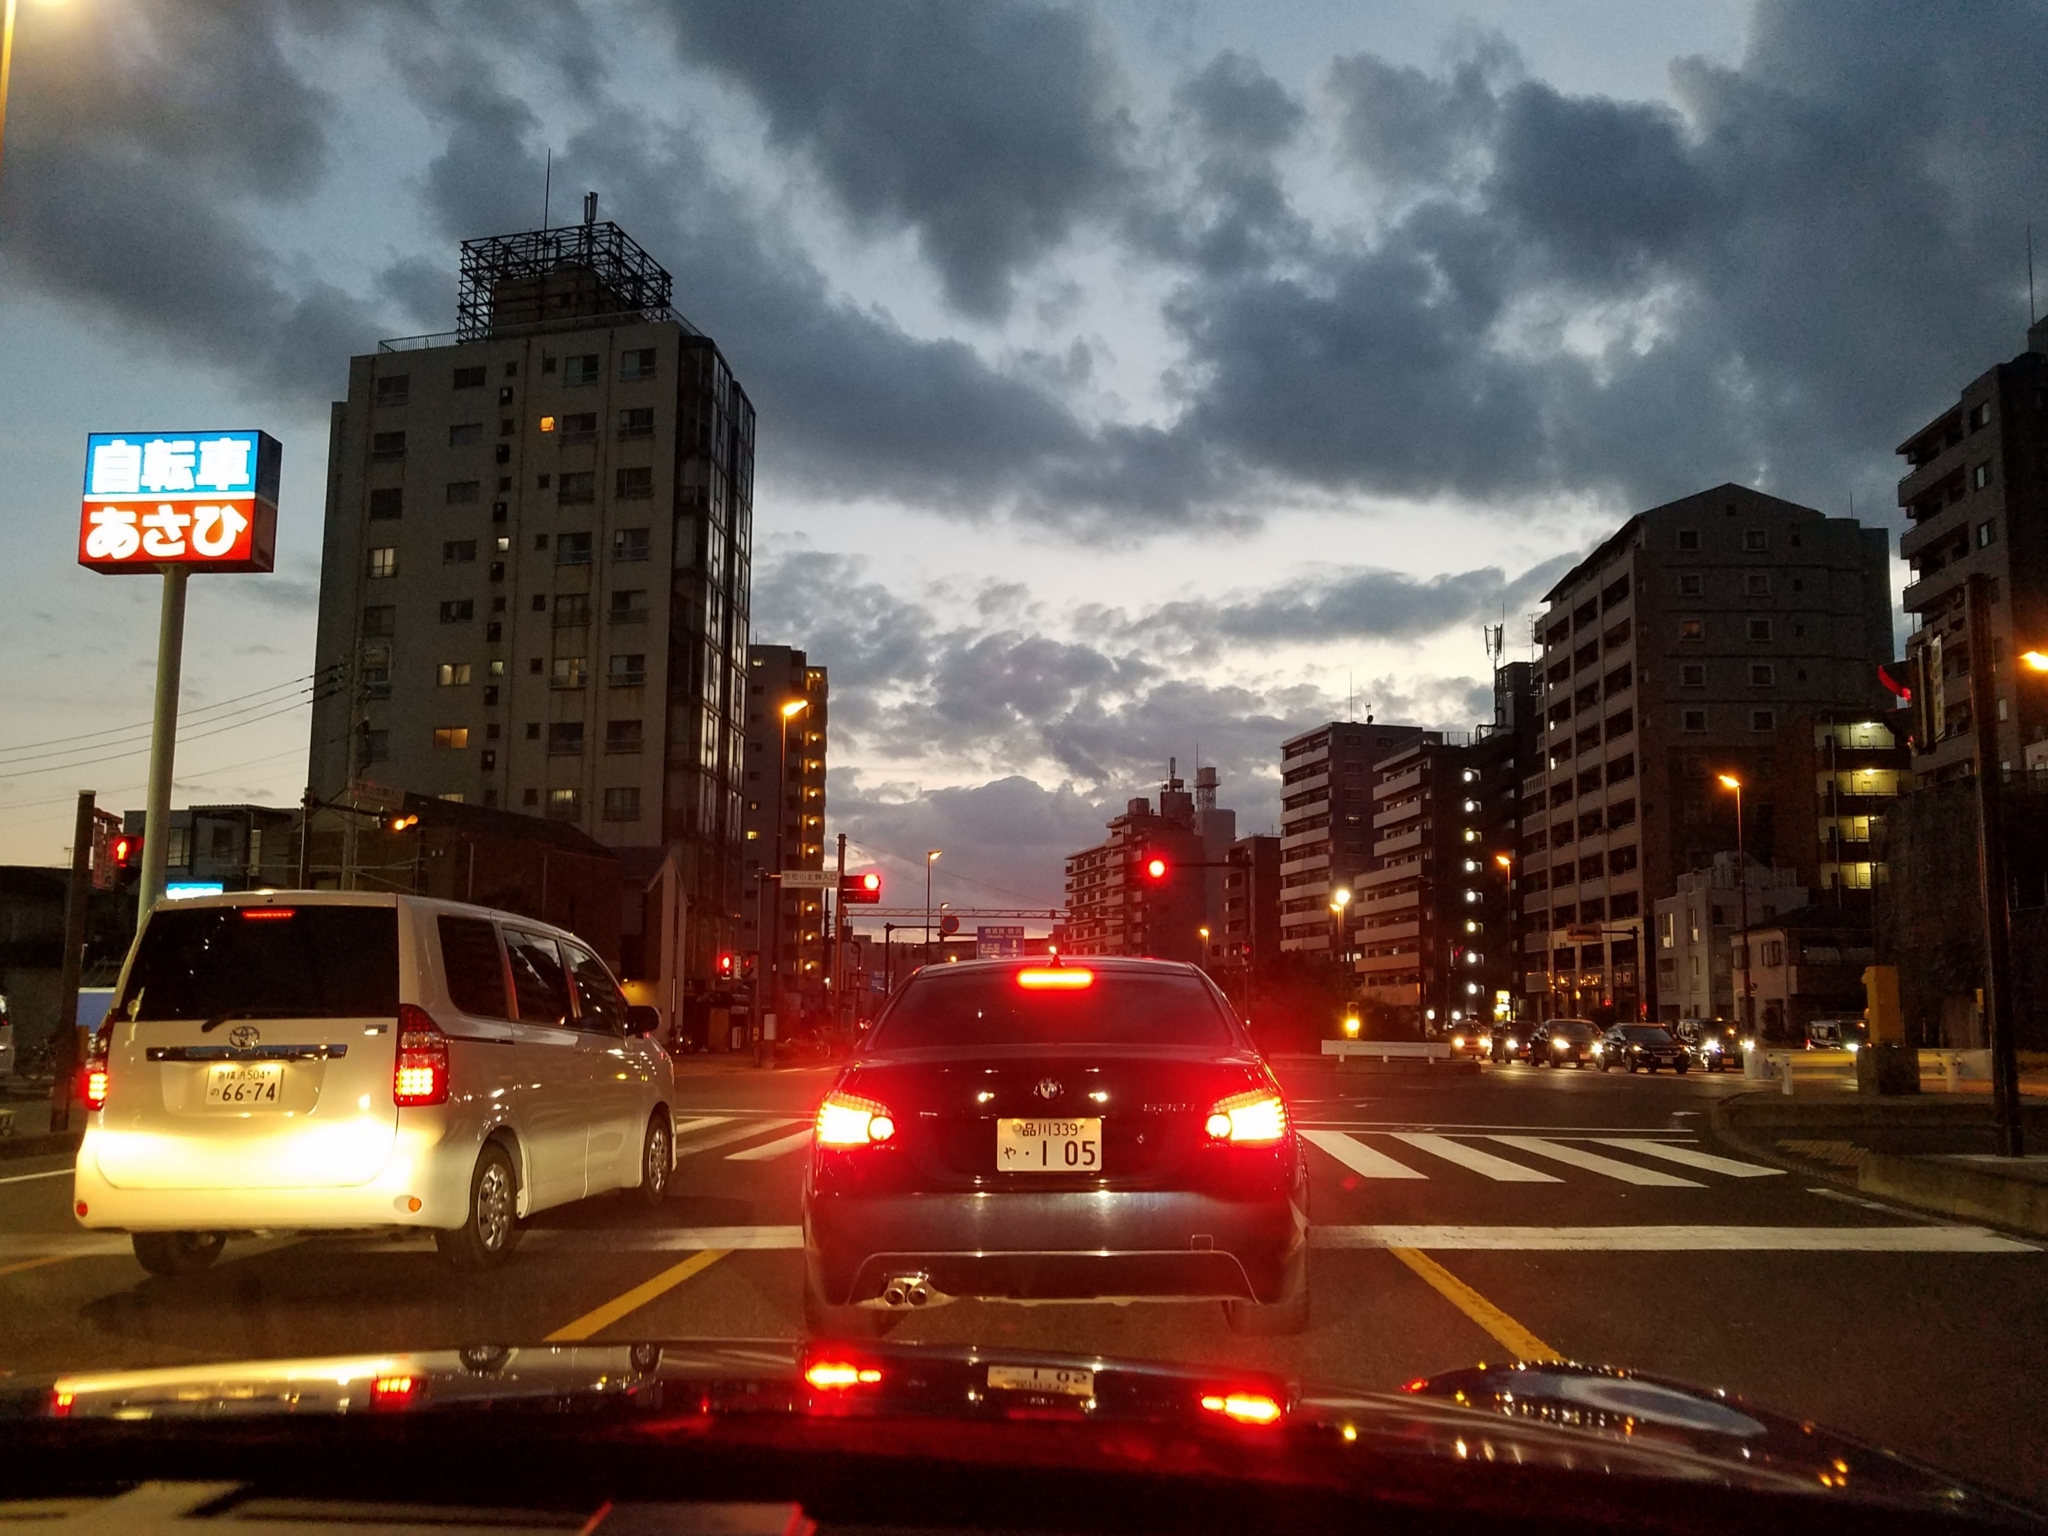 f:id:ToshUeno:20161016172241j:plain